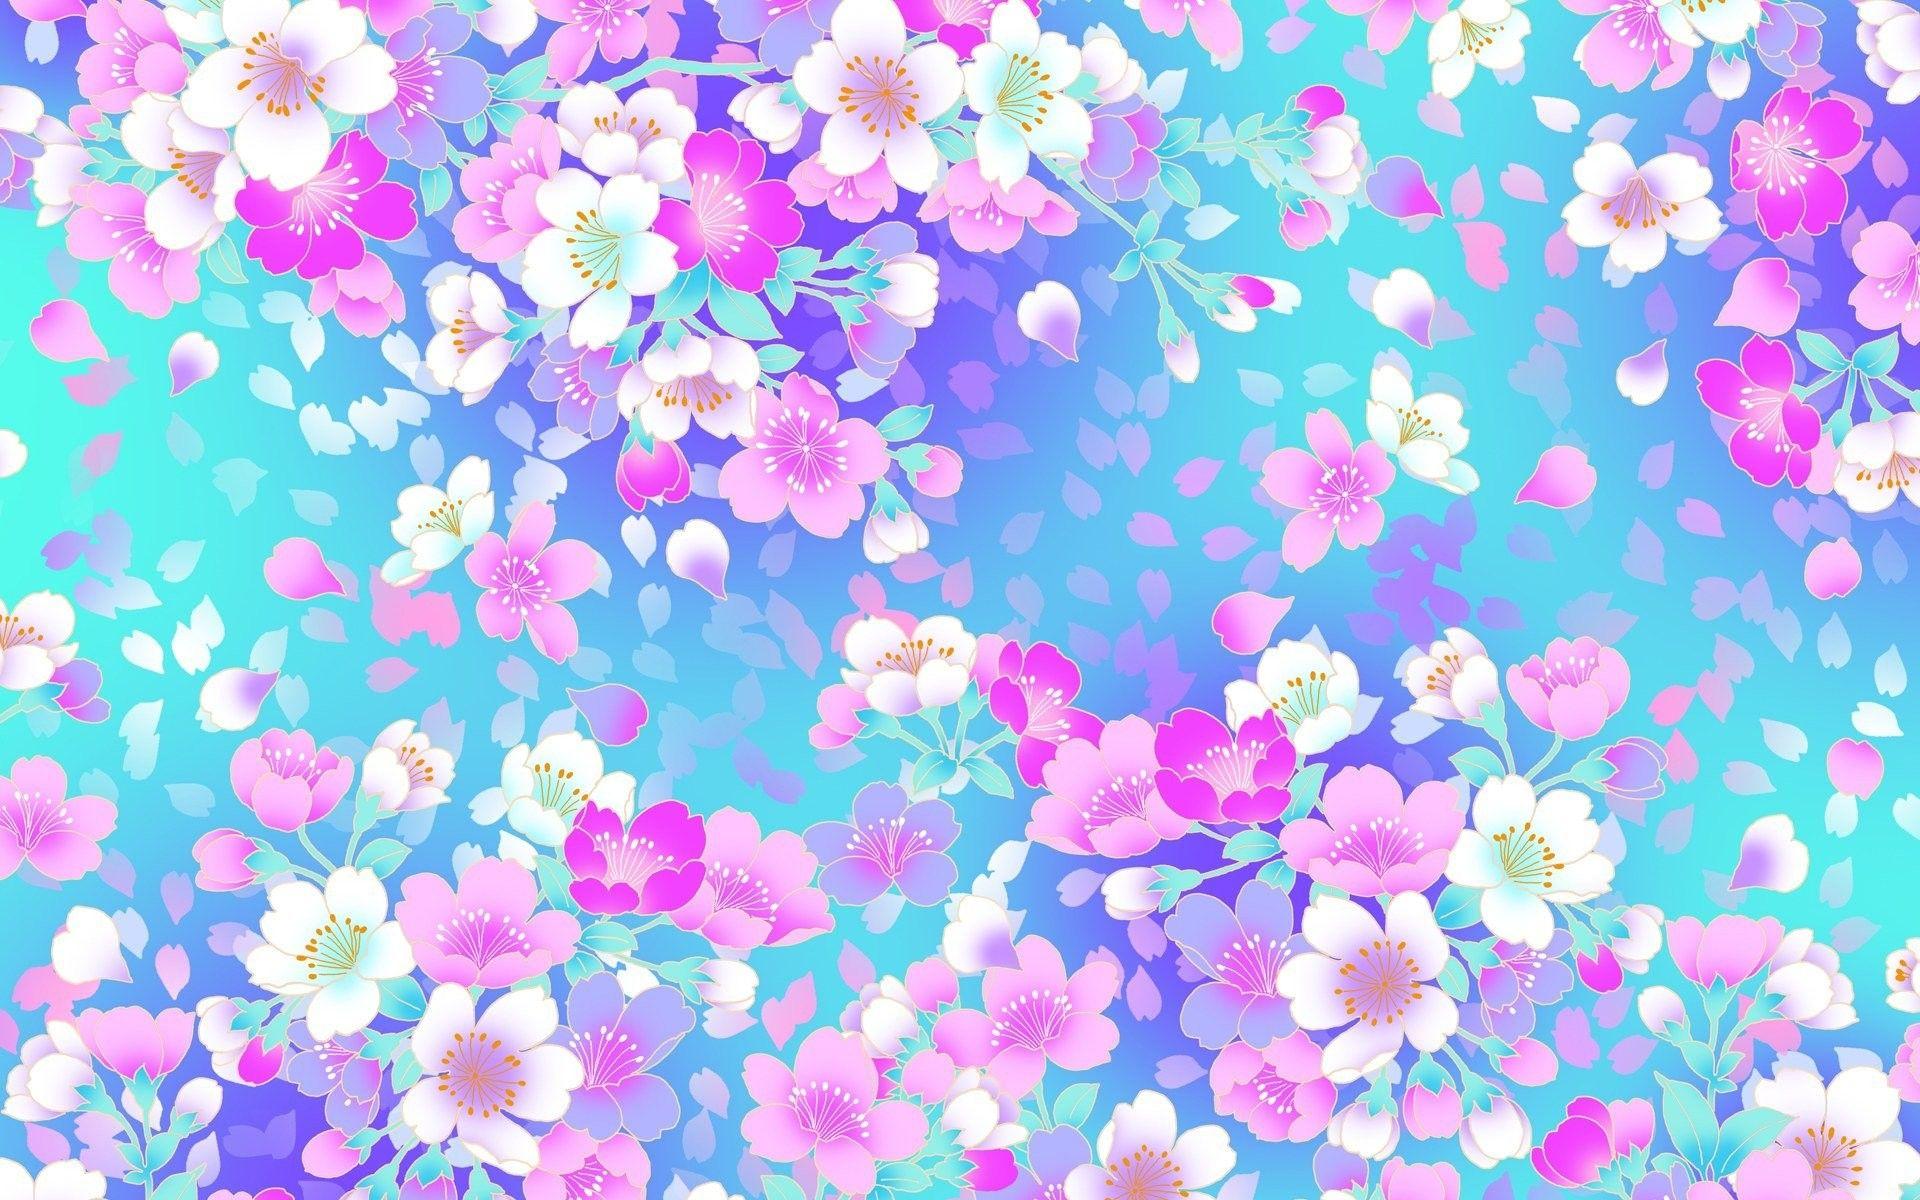 Pink Purple Blue Wallpaper 72 Images Pretty Wallpapers Tumblr Pretty Wallpapers Iphone Wallpaper Girly